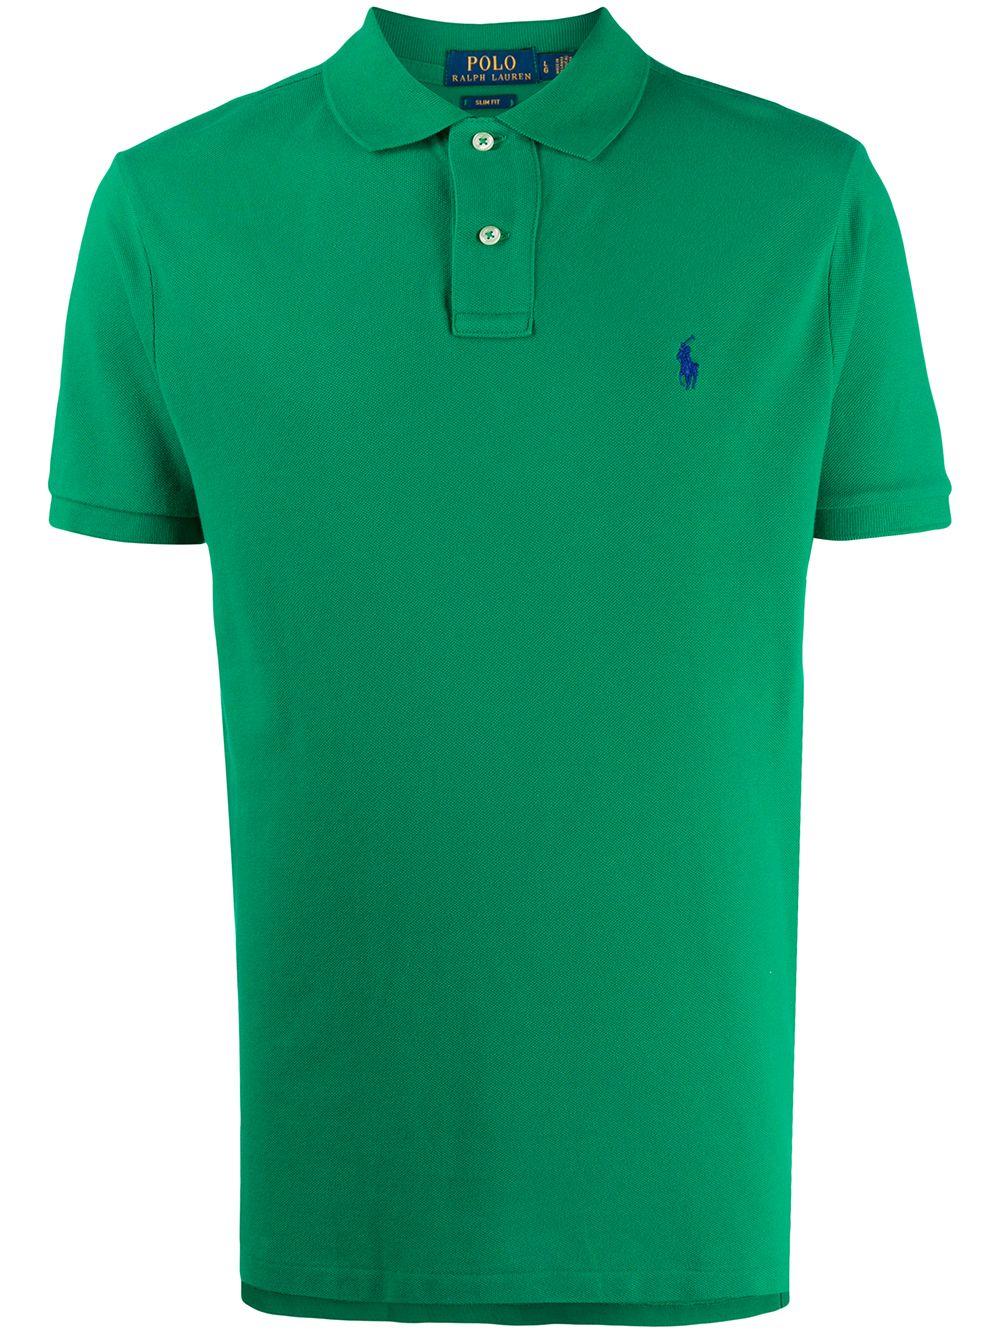 Polo Ralph Lauren 'Big Pony' Poloshirt - Grün